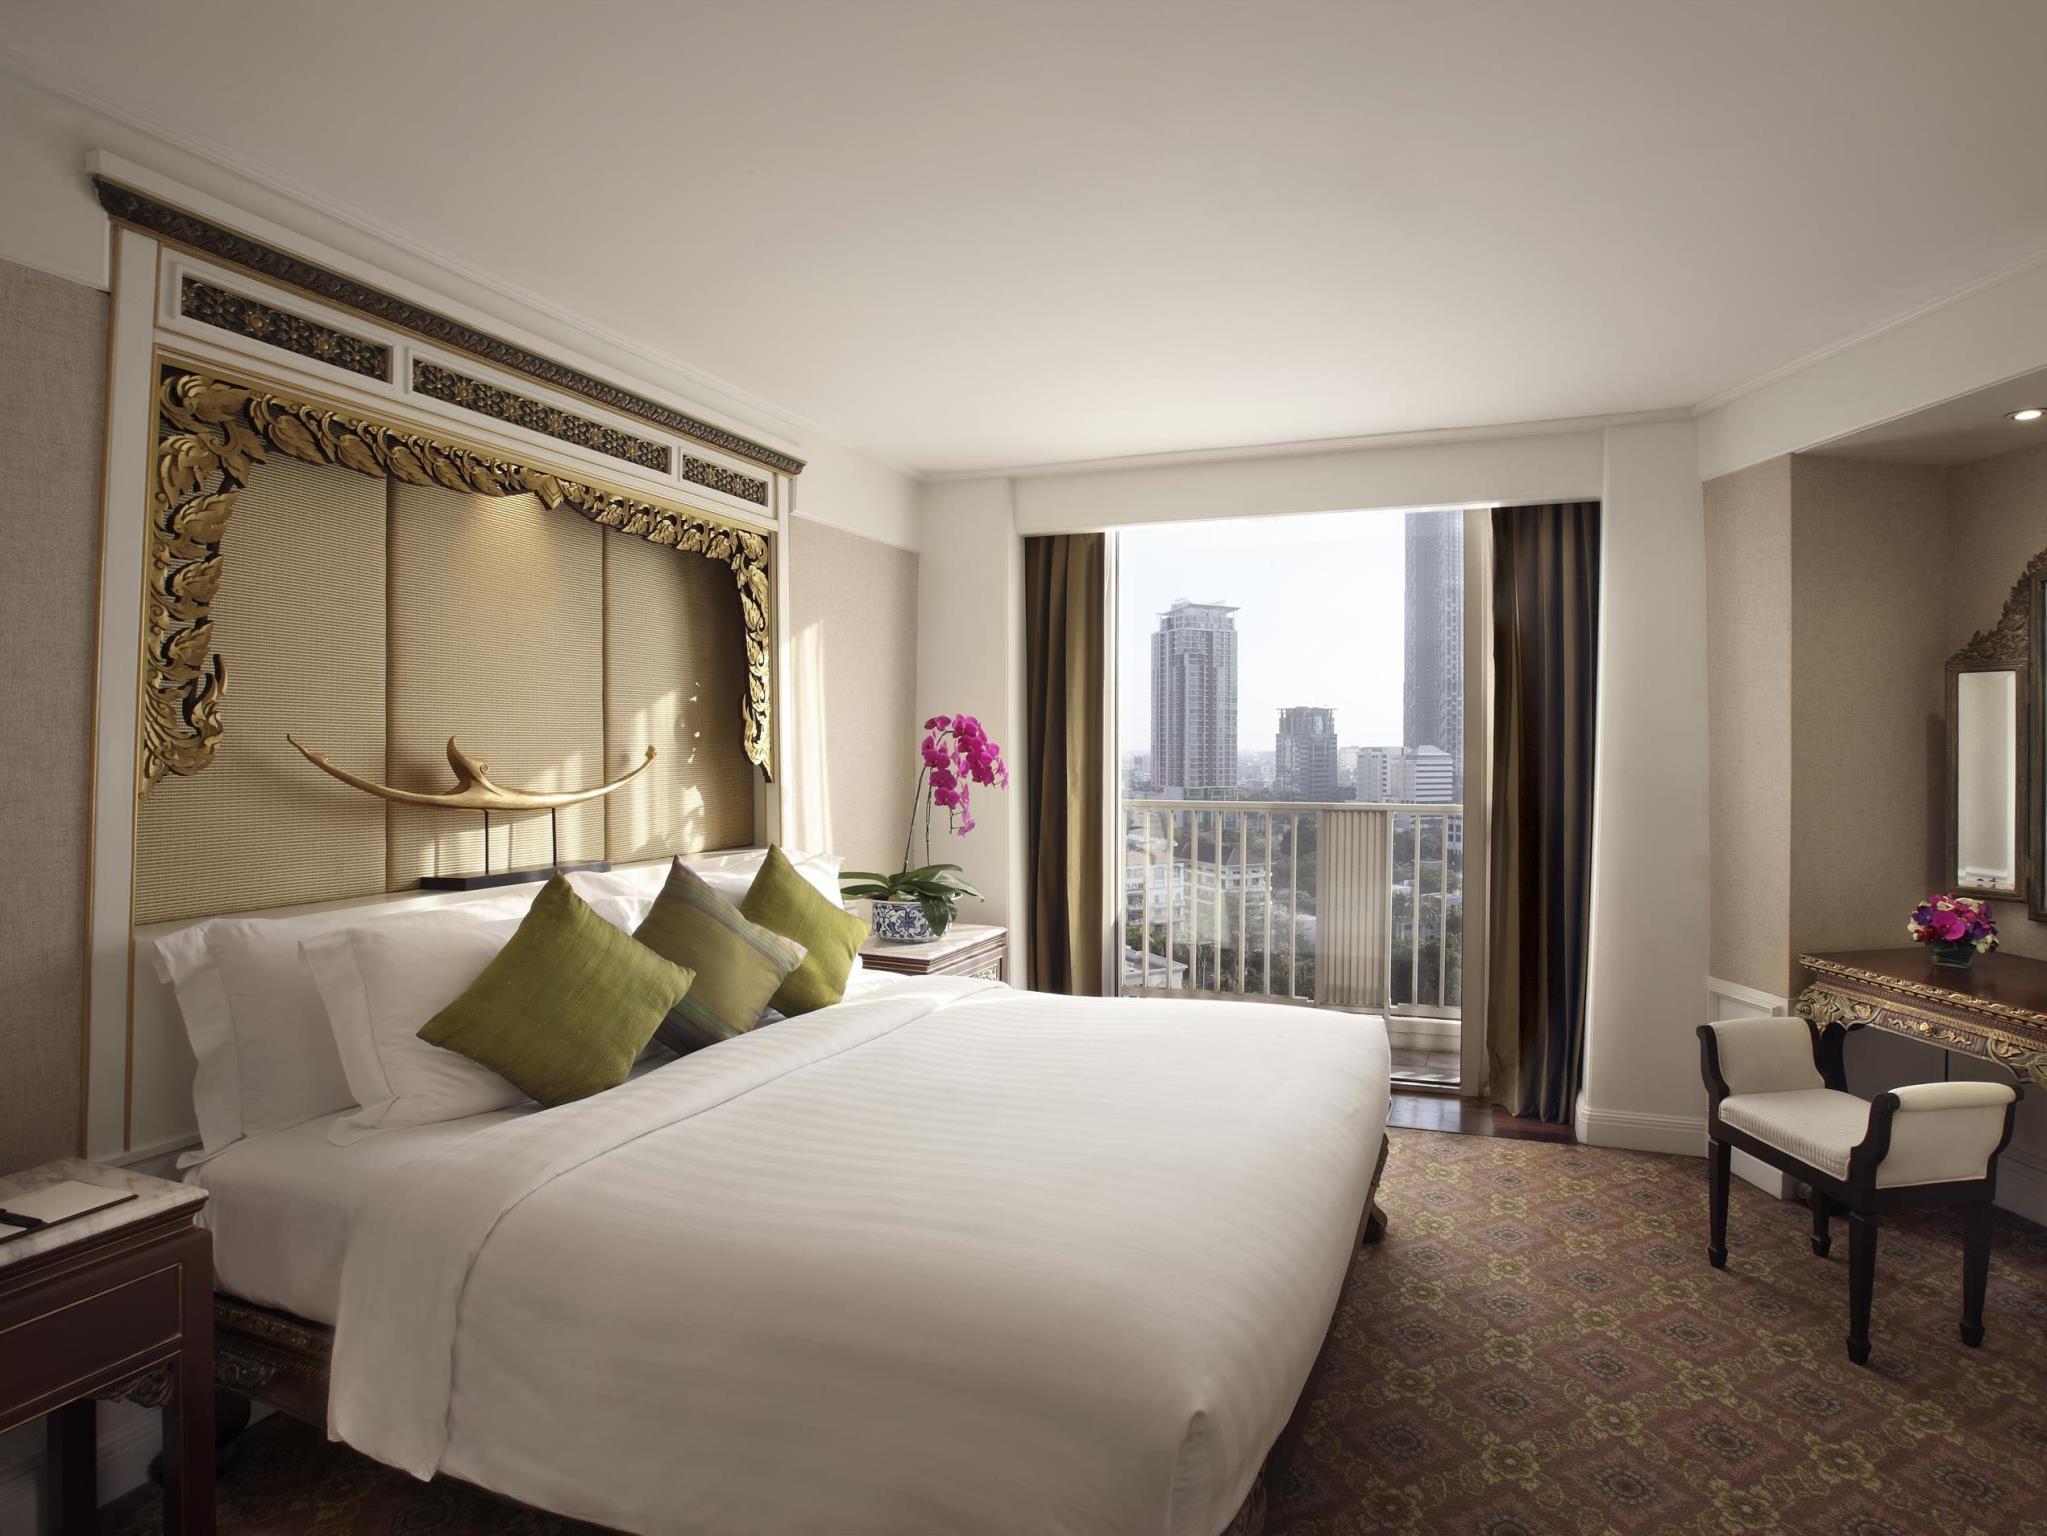 Dusit Thani Bangkok Hotel โรงแรมดุสิตธานี กรุงเทพ